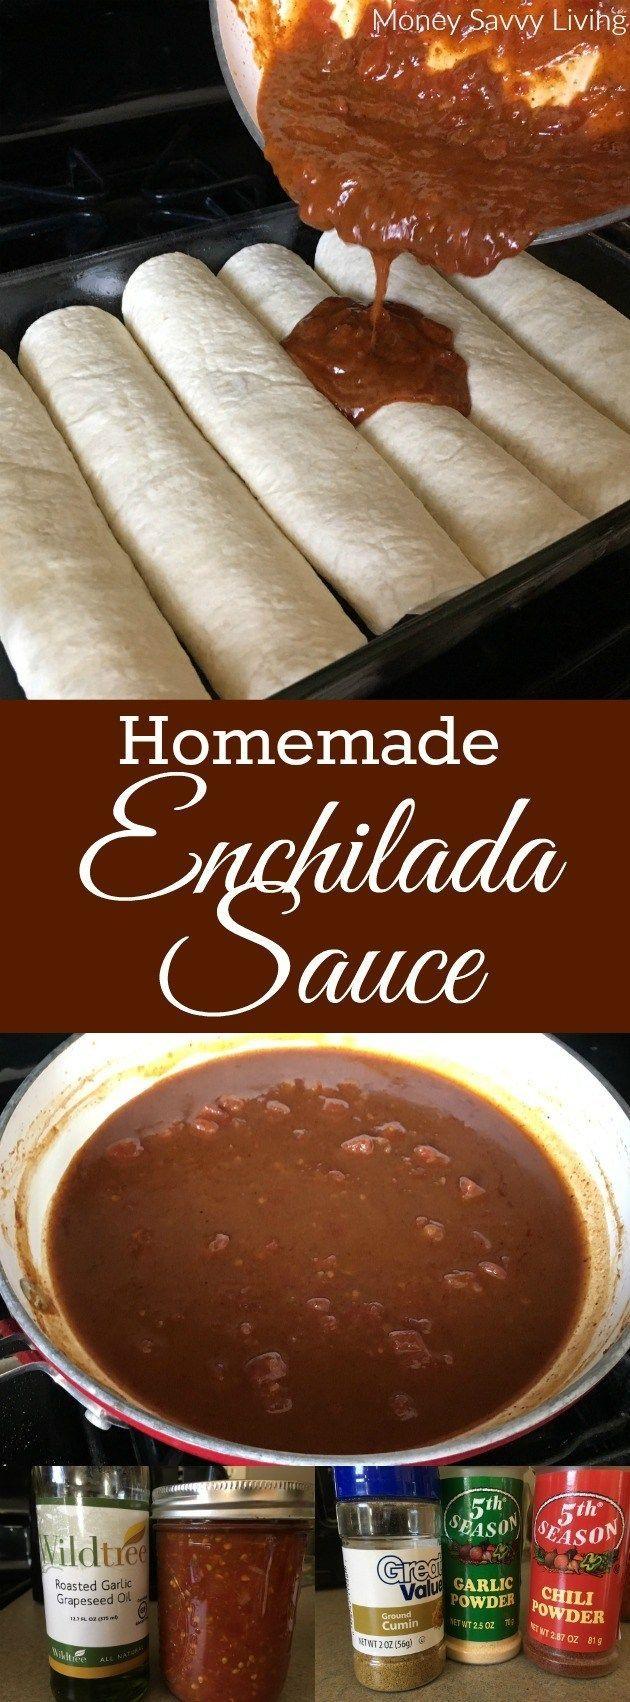 Homemade Enchilada Sauce.  Getting ready for Cinco de Mayo?  Try this delicious recipe for homemade enchilada sauce!   // Money Savvy Living